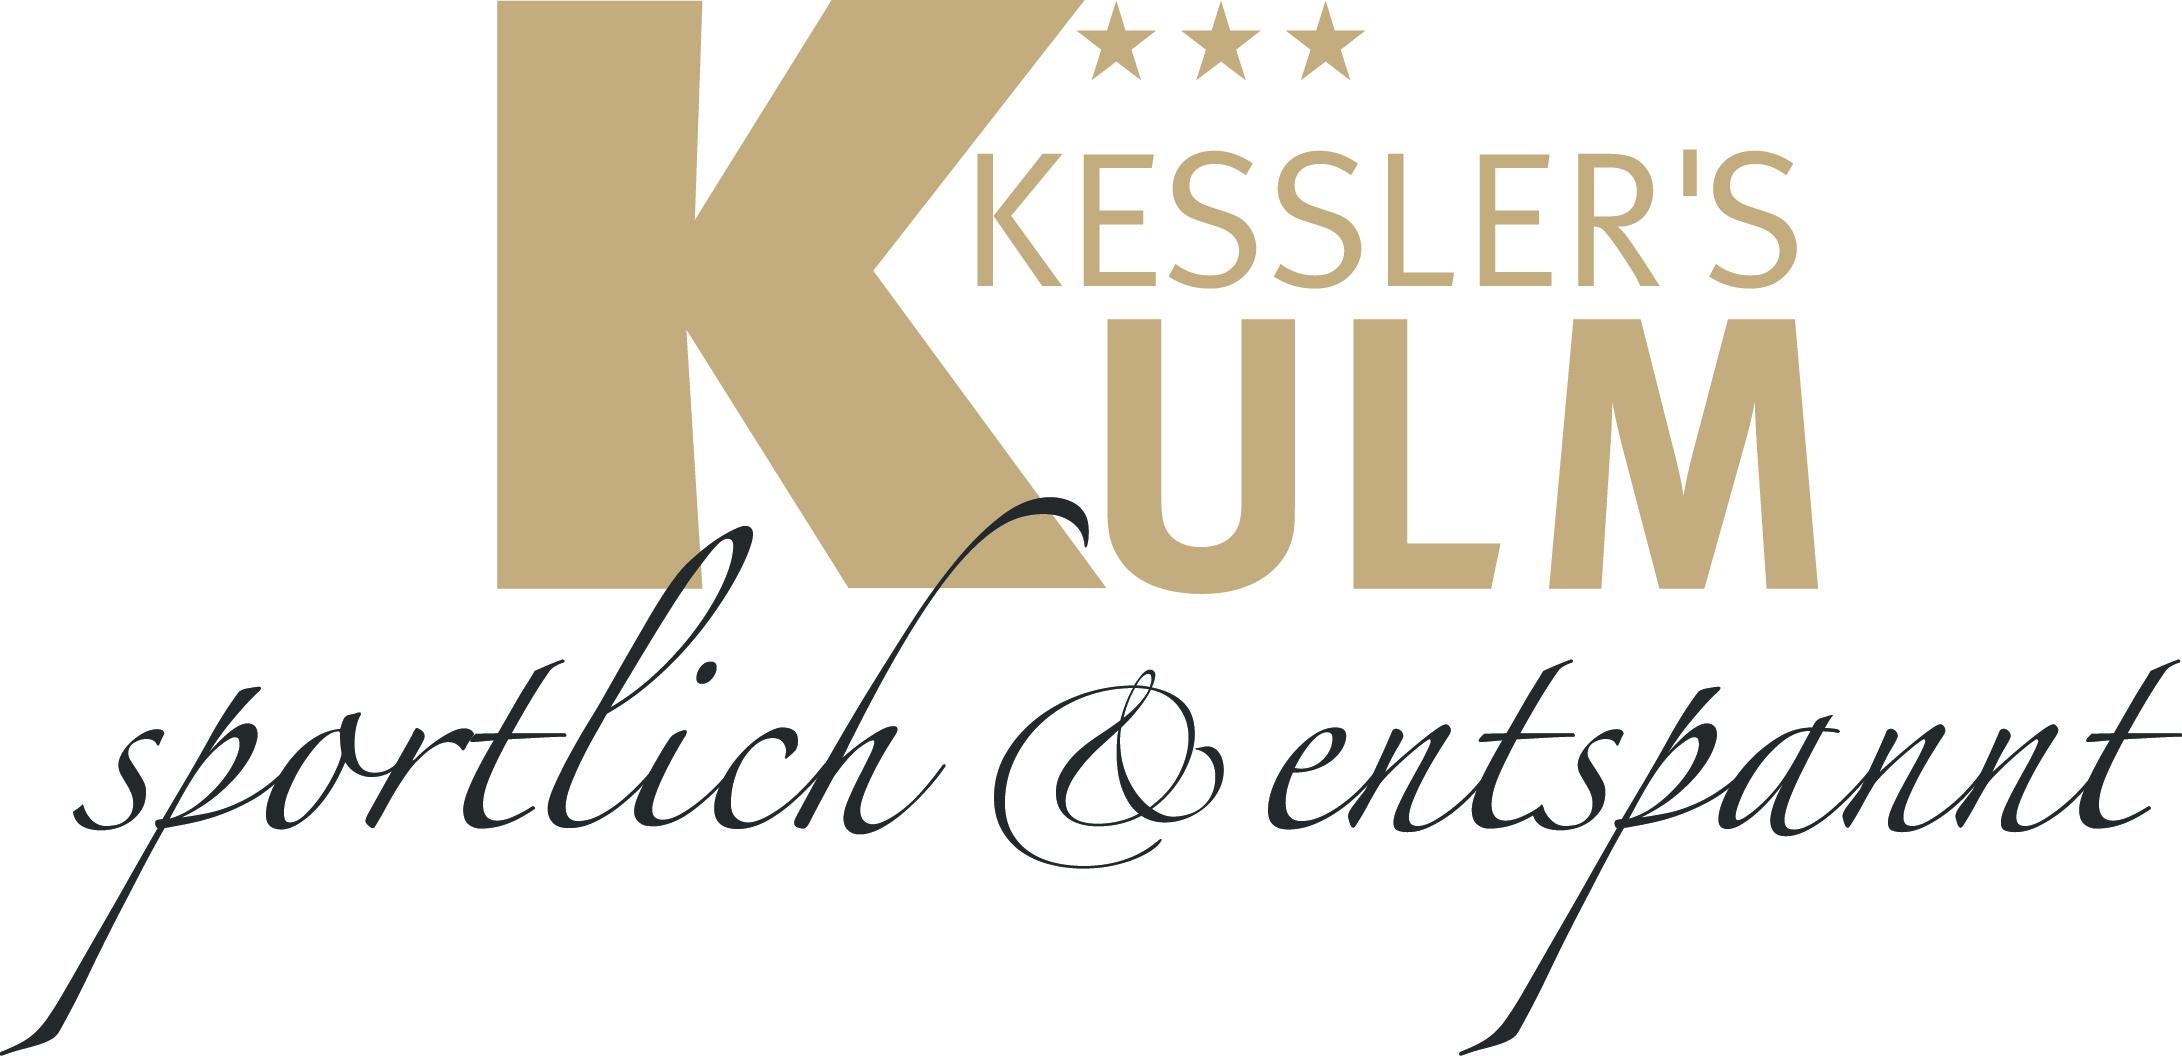 Hotel Kessler's Kulm Davos - Backcountry Festival Davos